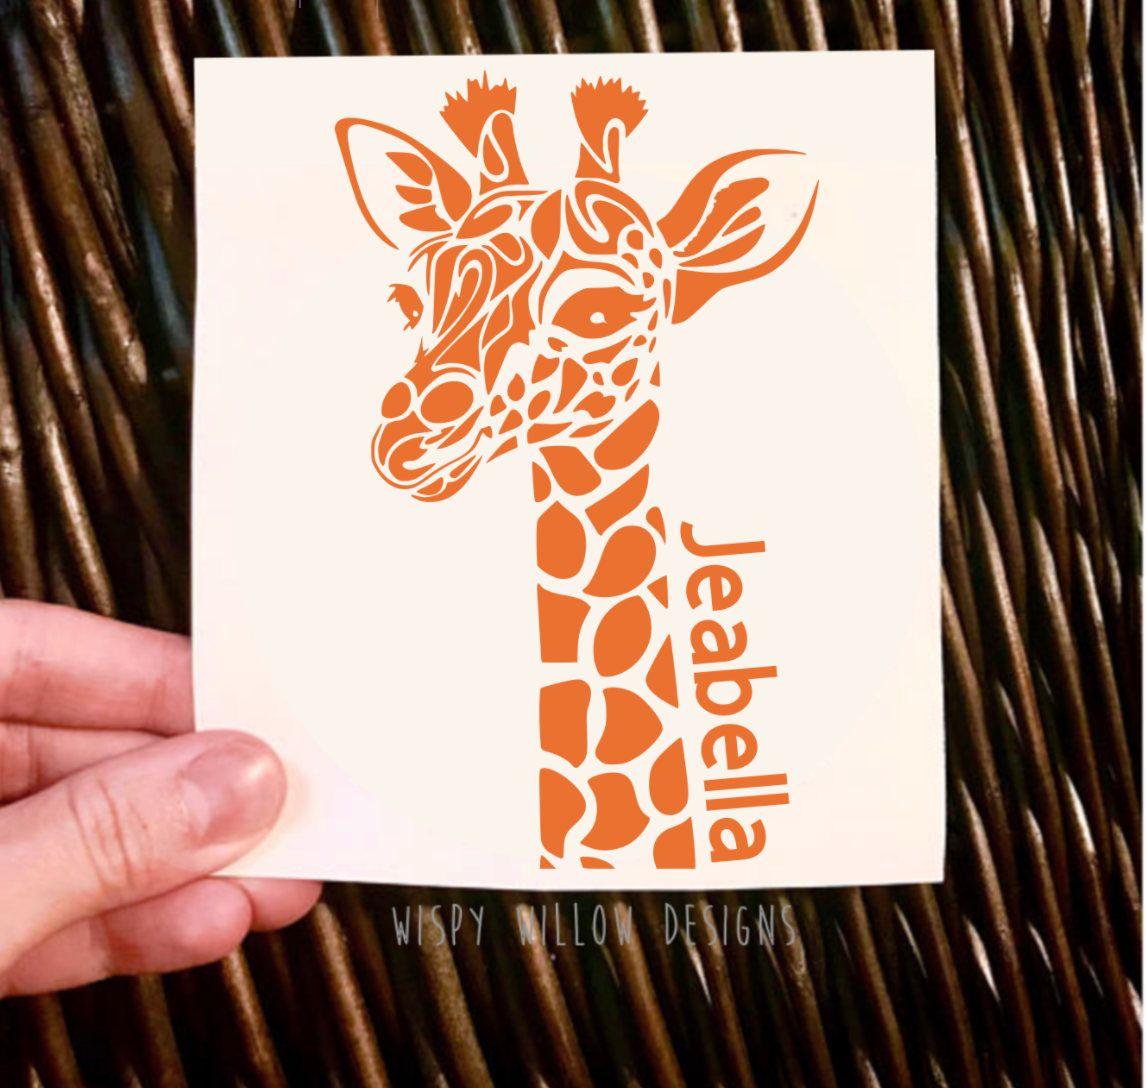 Personalized Giraffe Vinyl Decal Giraffe Decal Name Decal Animal Tumbler Car Decal Sticker Animal Decal Giraff Giraffe Decal Vinyl Decals Vinyl Tshirts